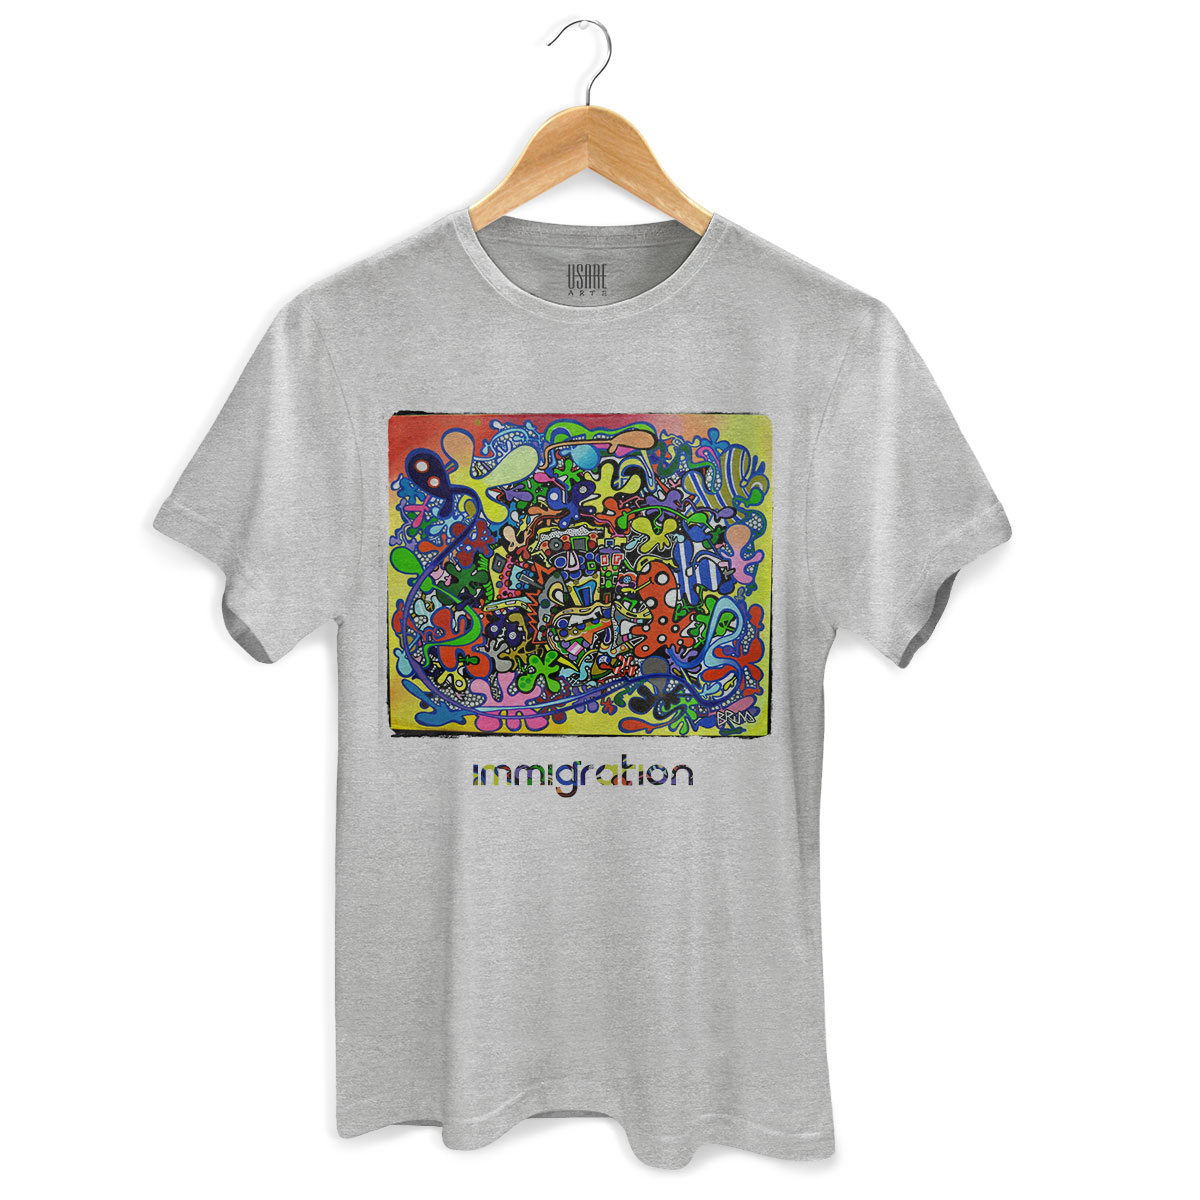 Camiseta Masculina Bruna Immigration Gray